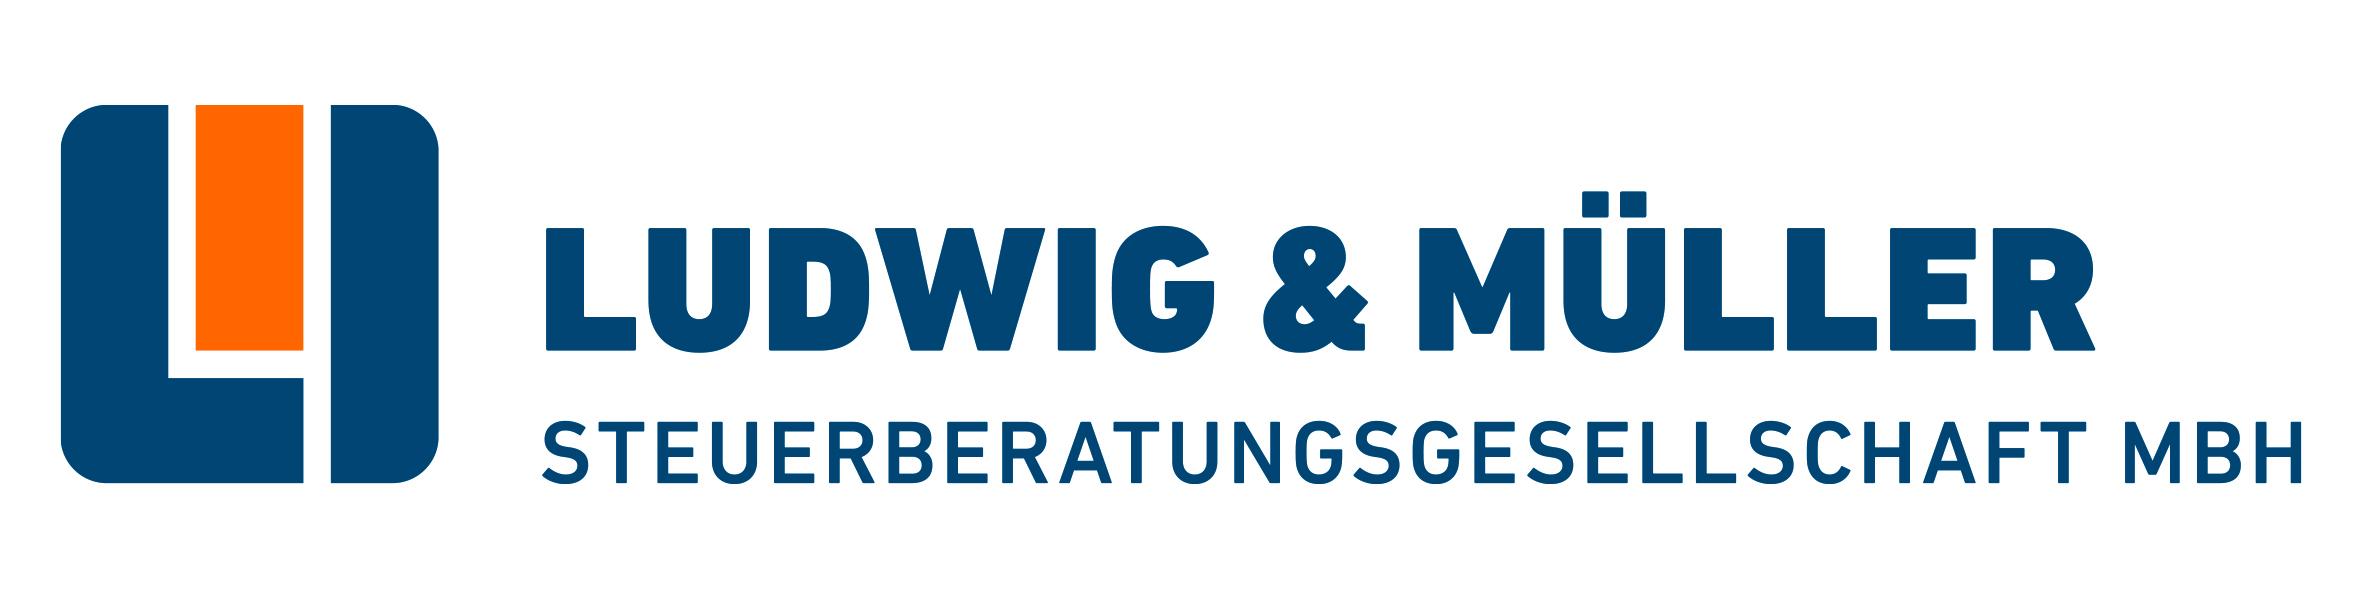 Ludwig & Müller